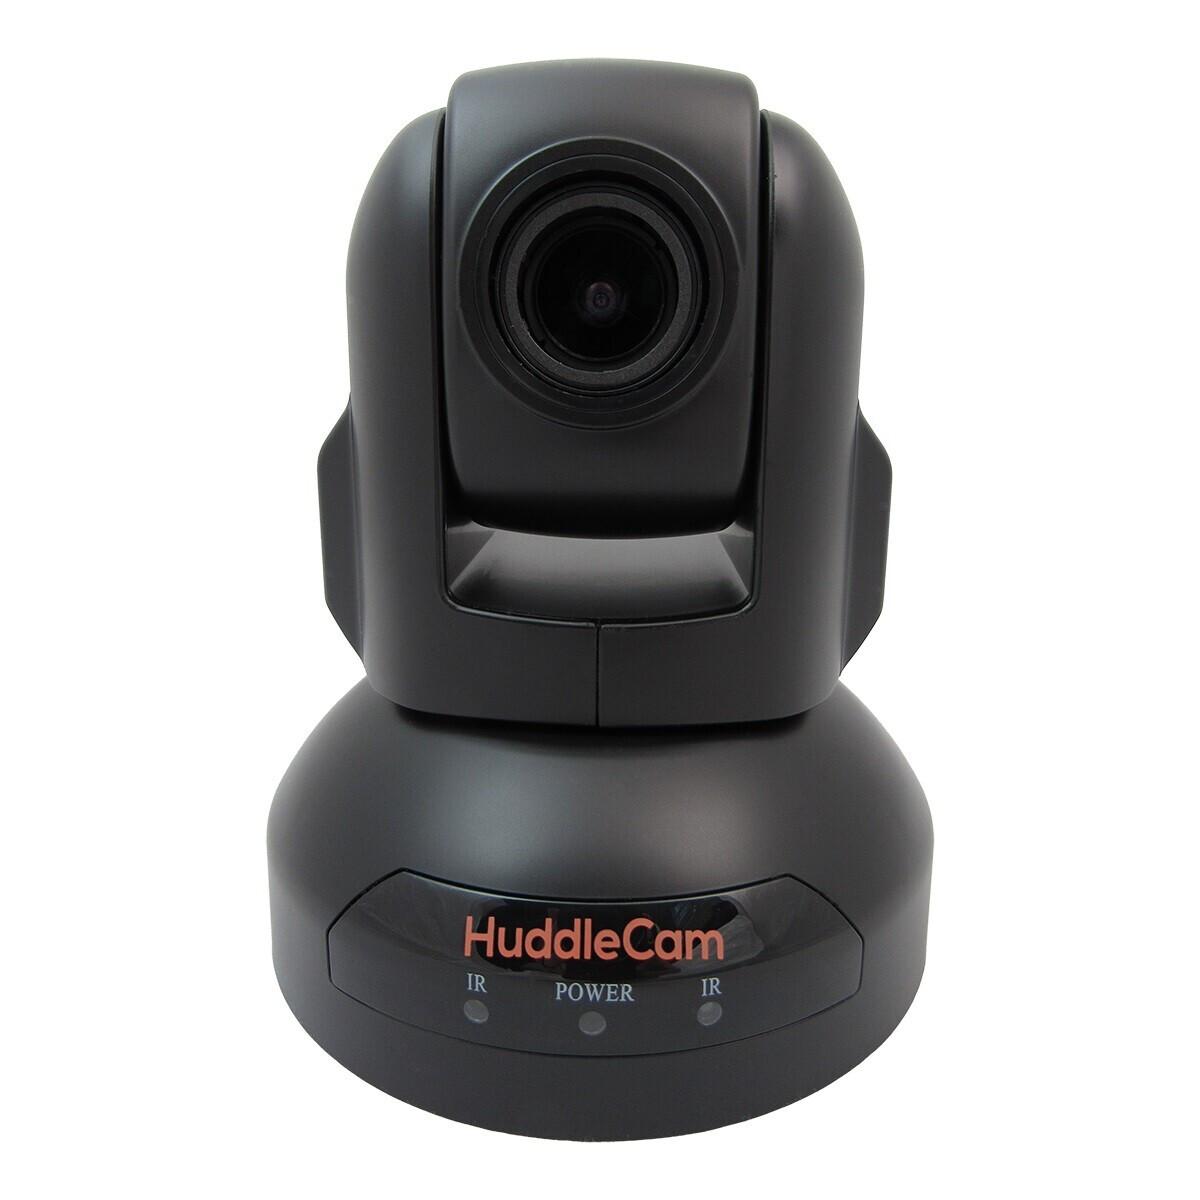 HuddleCamHD HC3X-BK-G2-C telecamera PTZ, colore nero